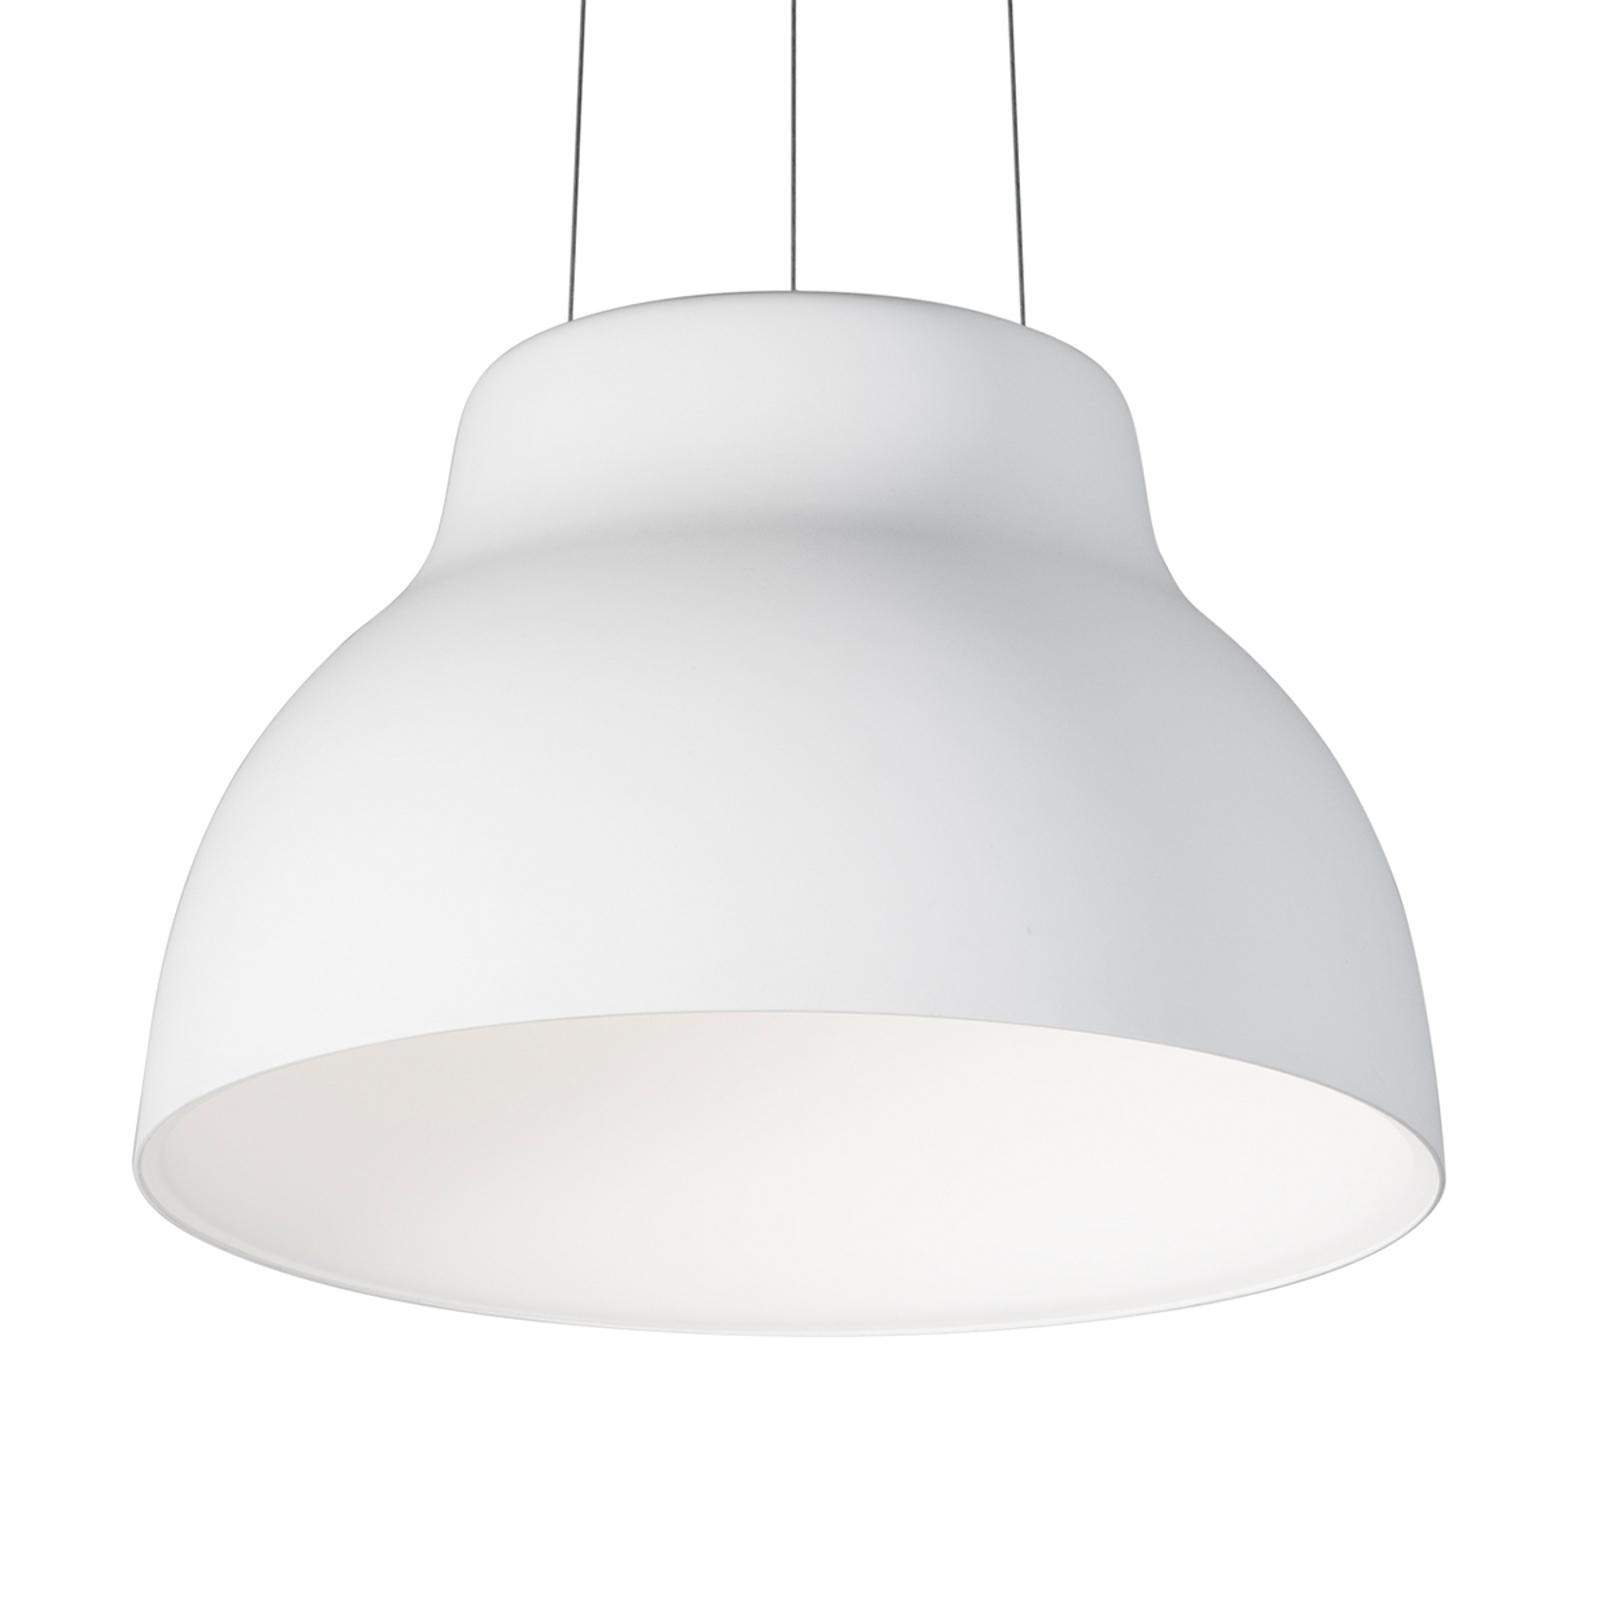 Martinelli Luce Cicala - LED-pendellampe, hvit